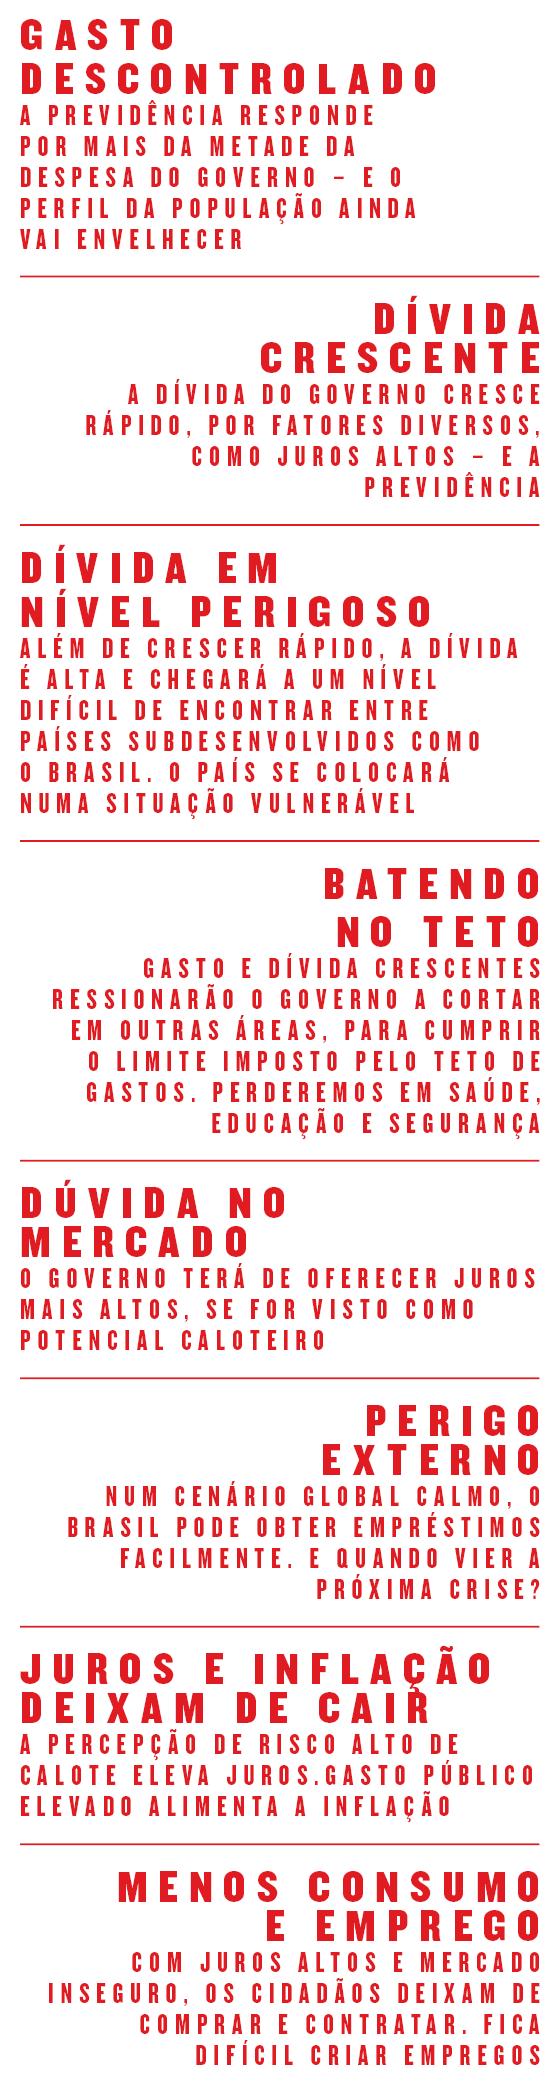 Economia (Foto: Revista ÉPOCA)